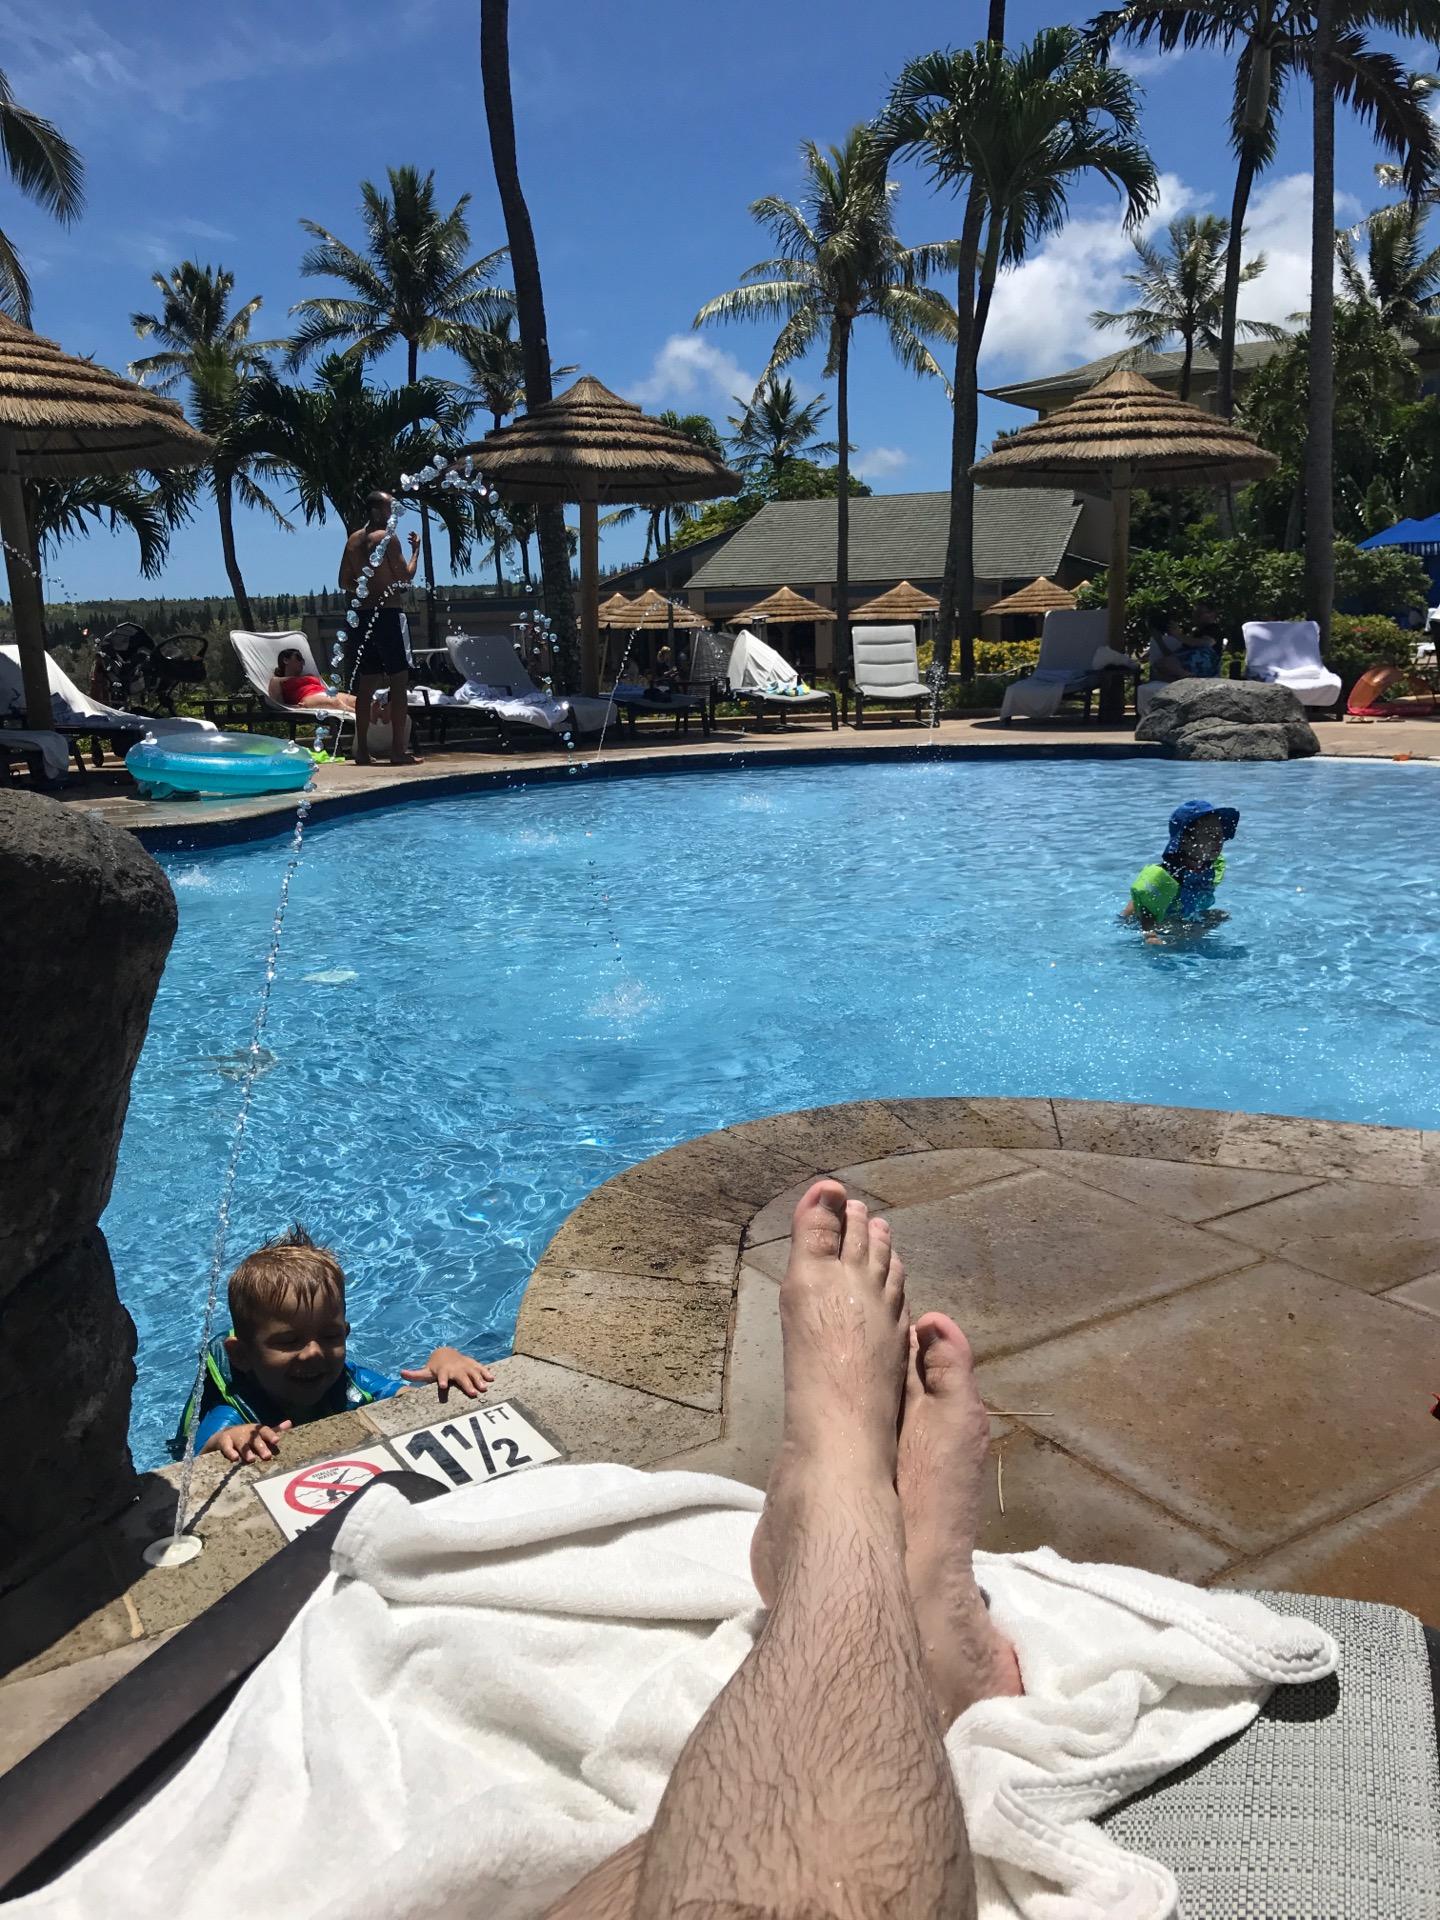 The Pool at The Ritz-Carlton Kapalua